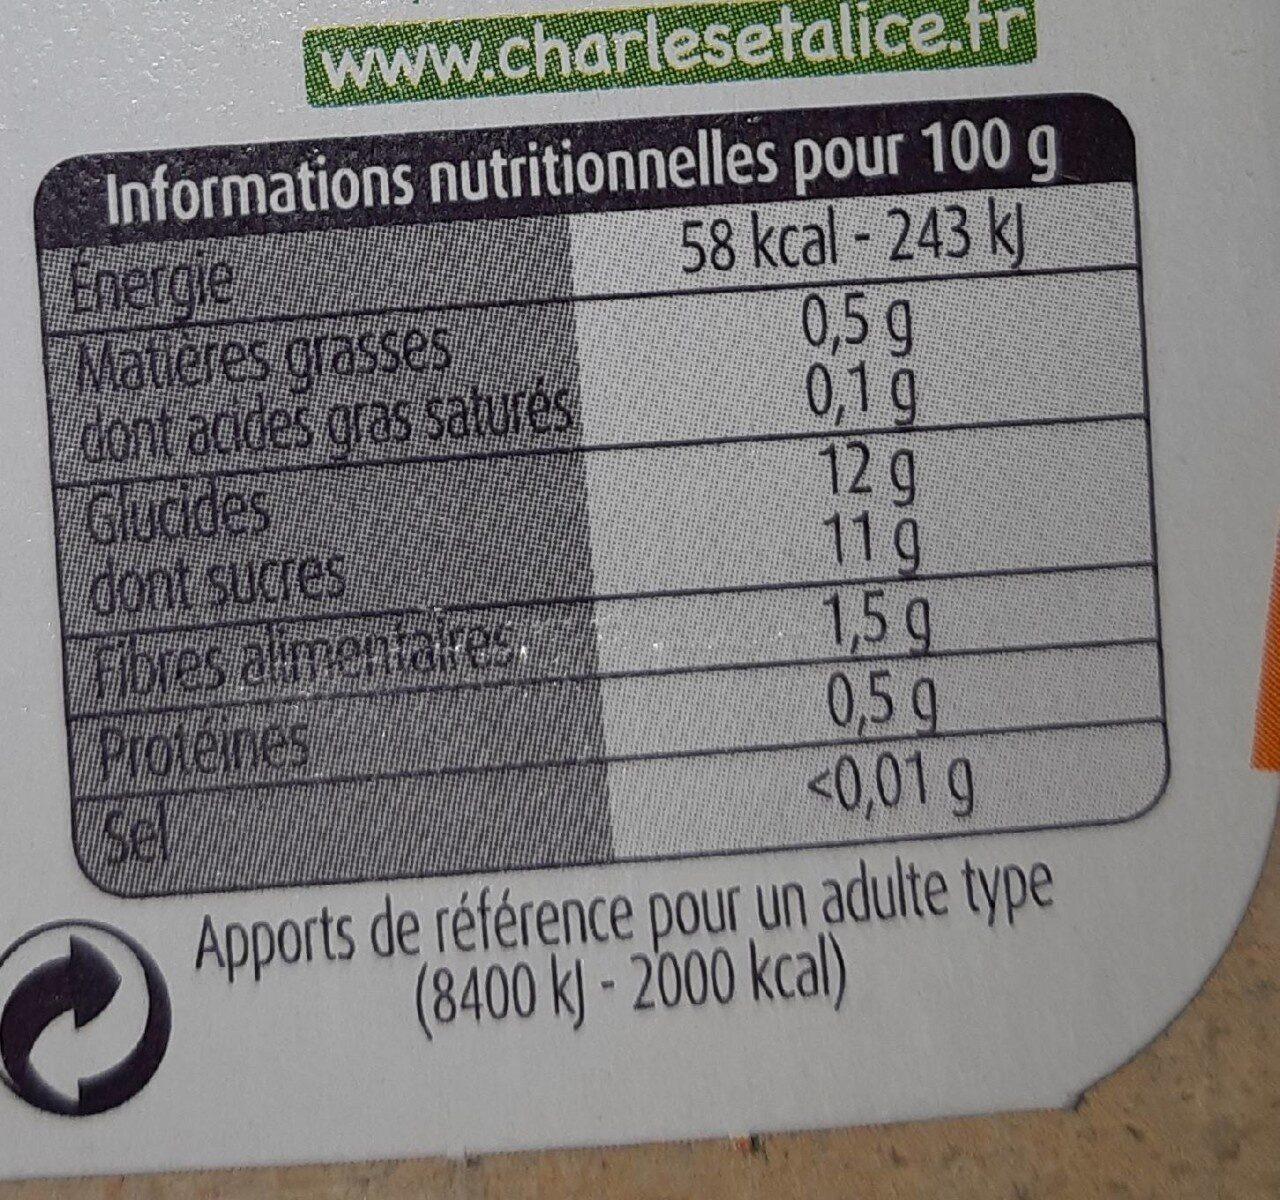 Pommes abricots bergeron SSA - Información nutricional - fr